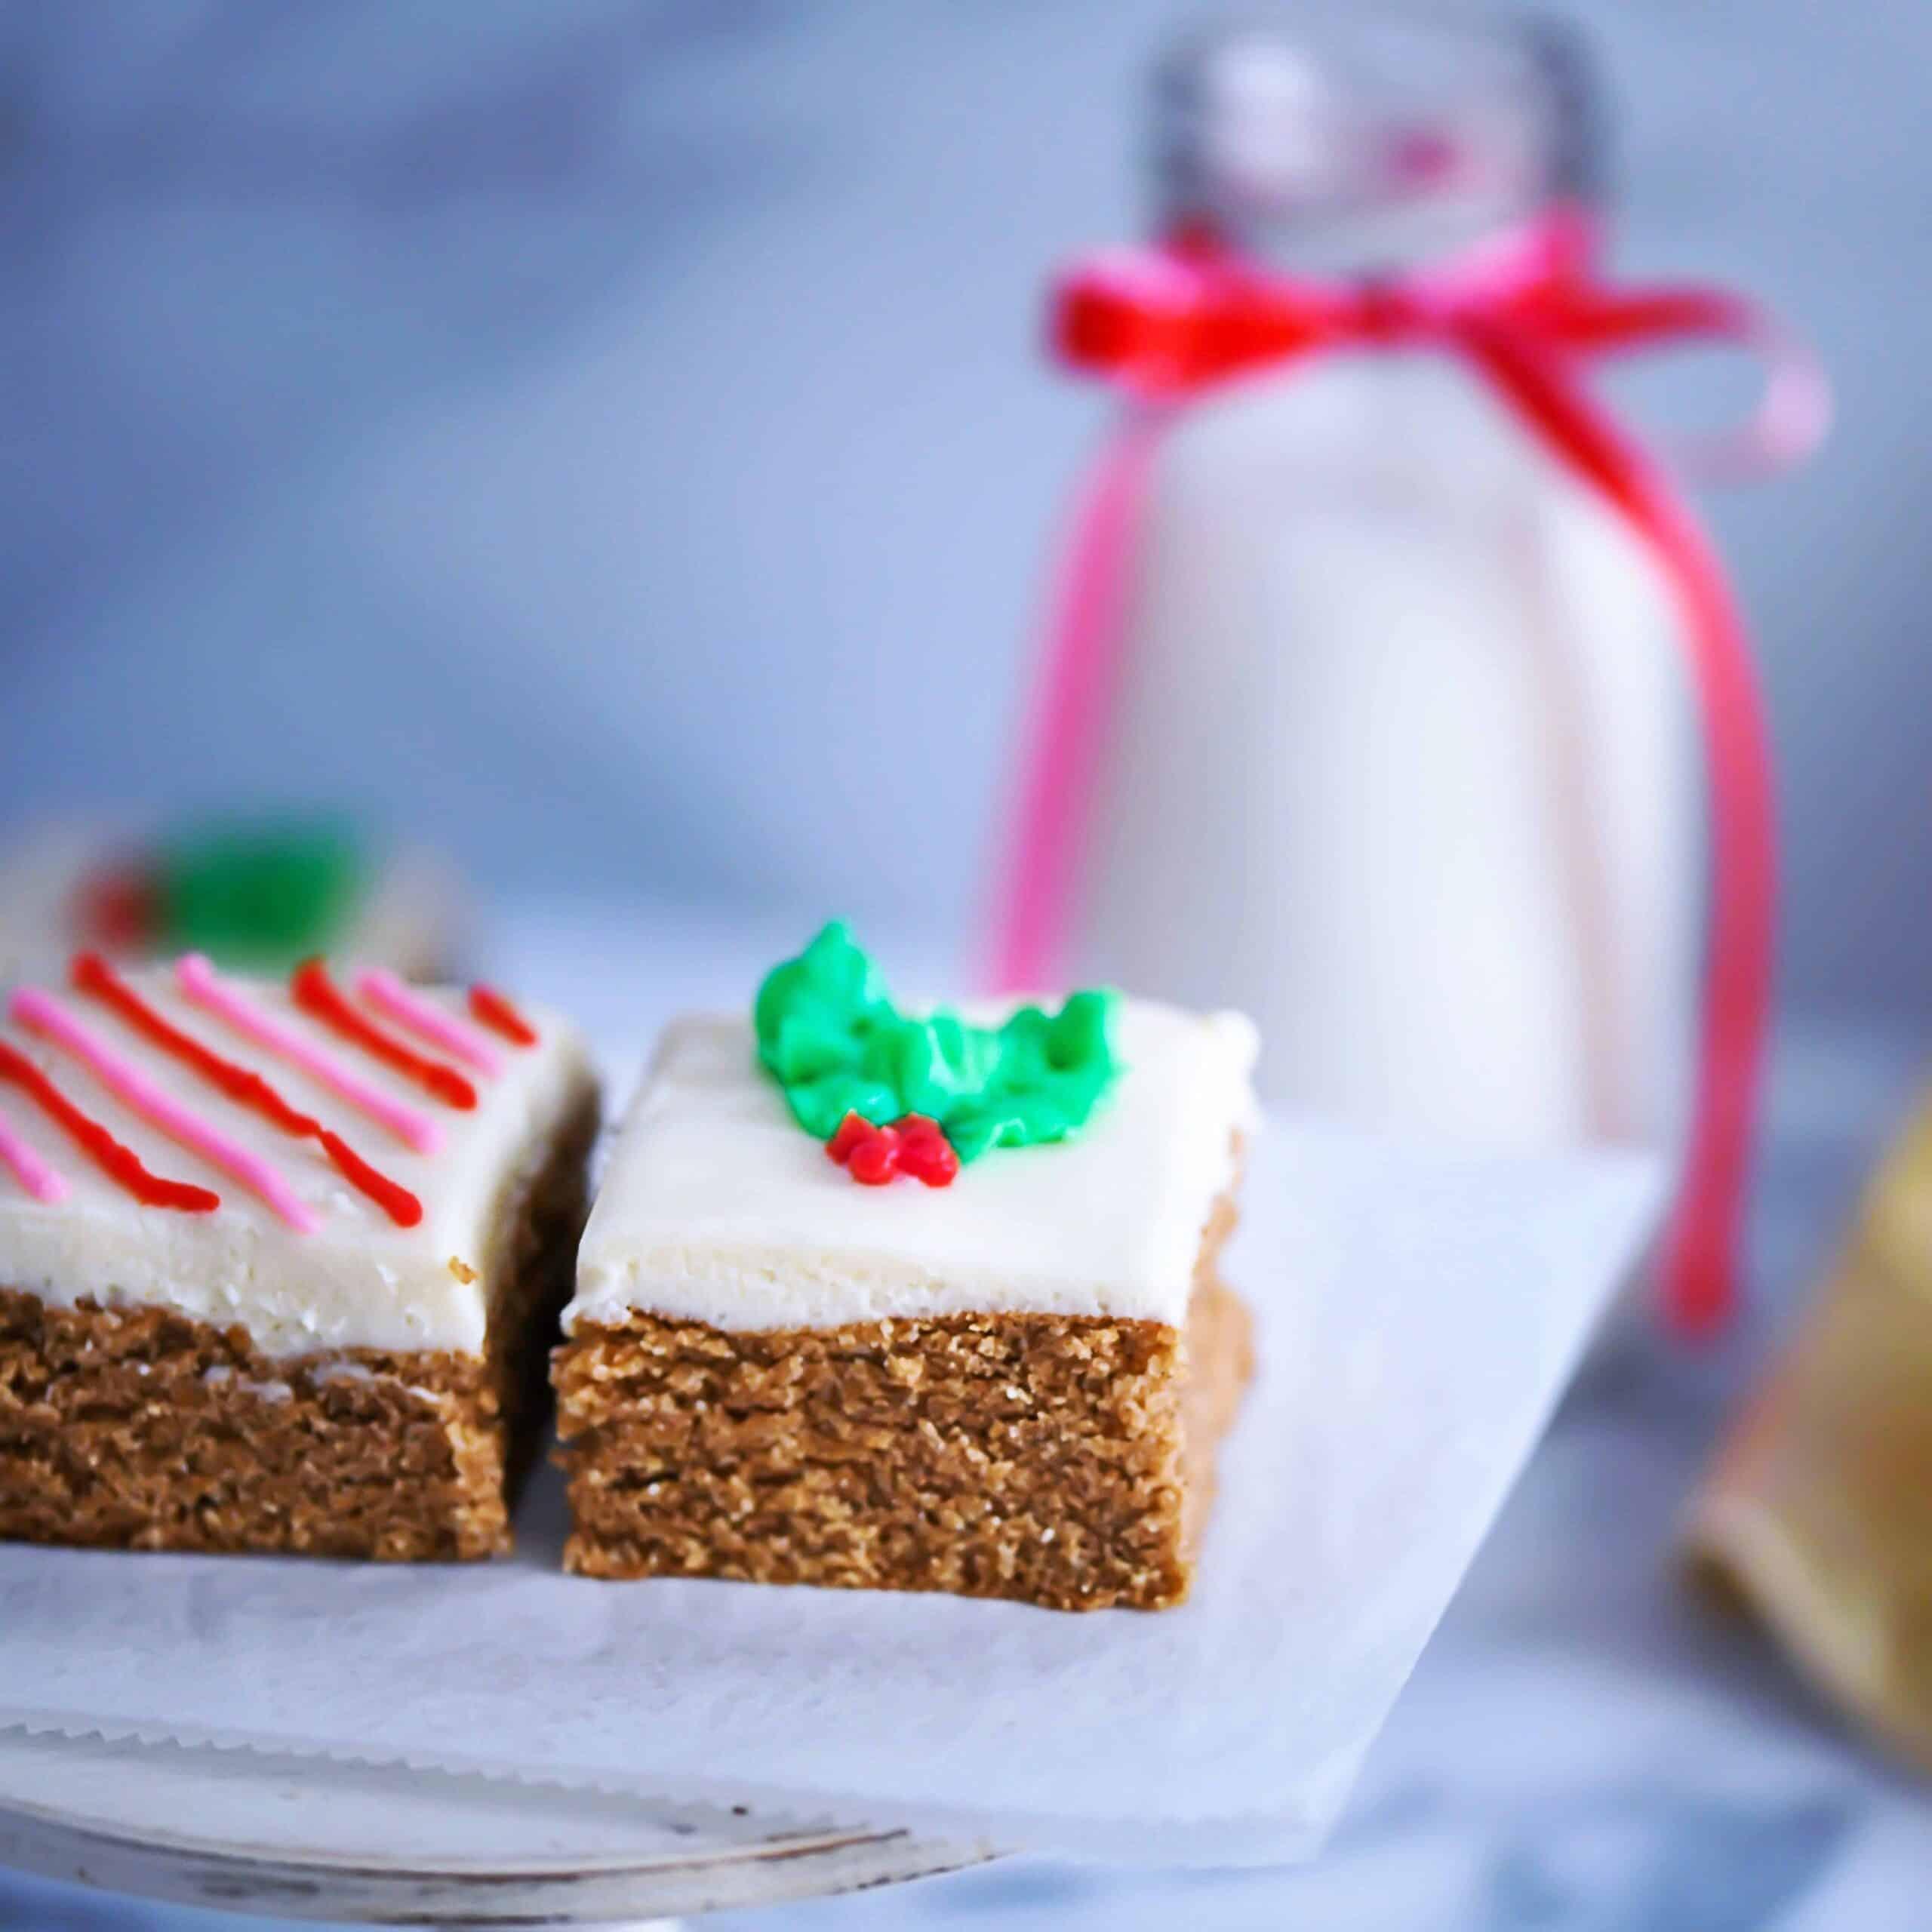 Gluten-free, sugar-free gingerbread